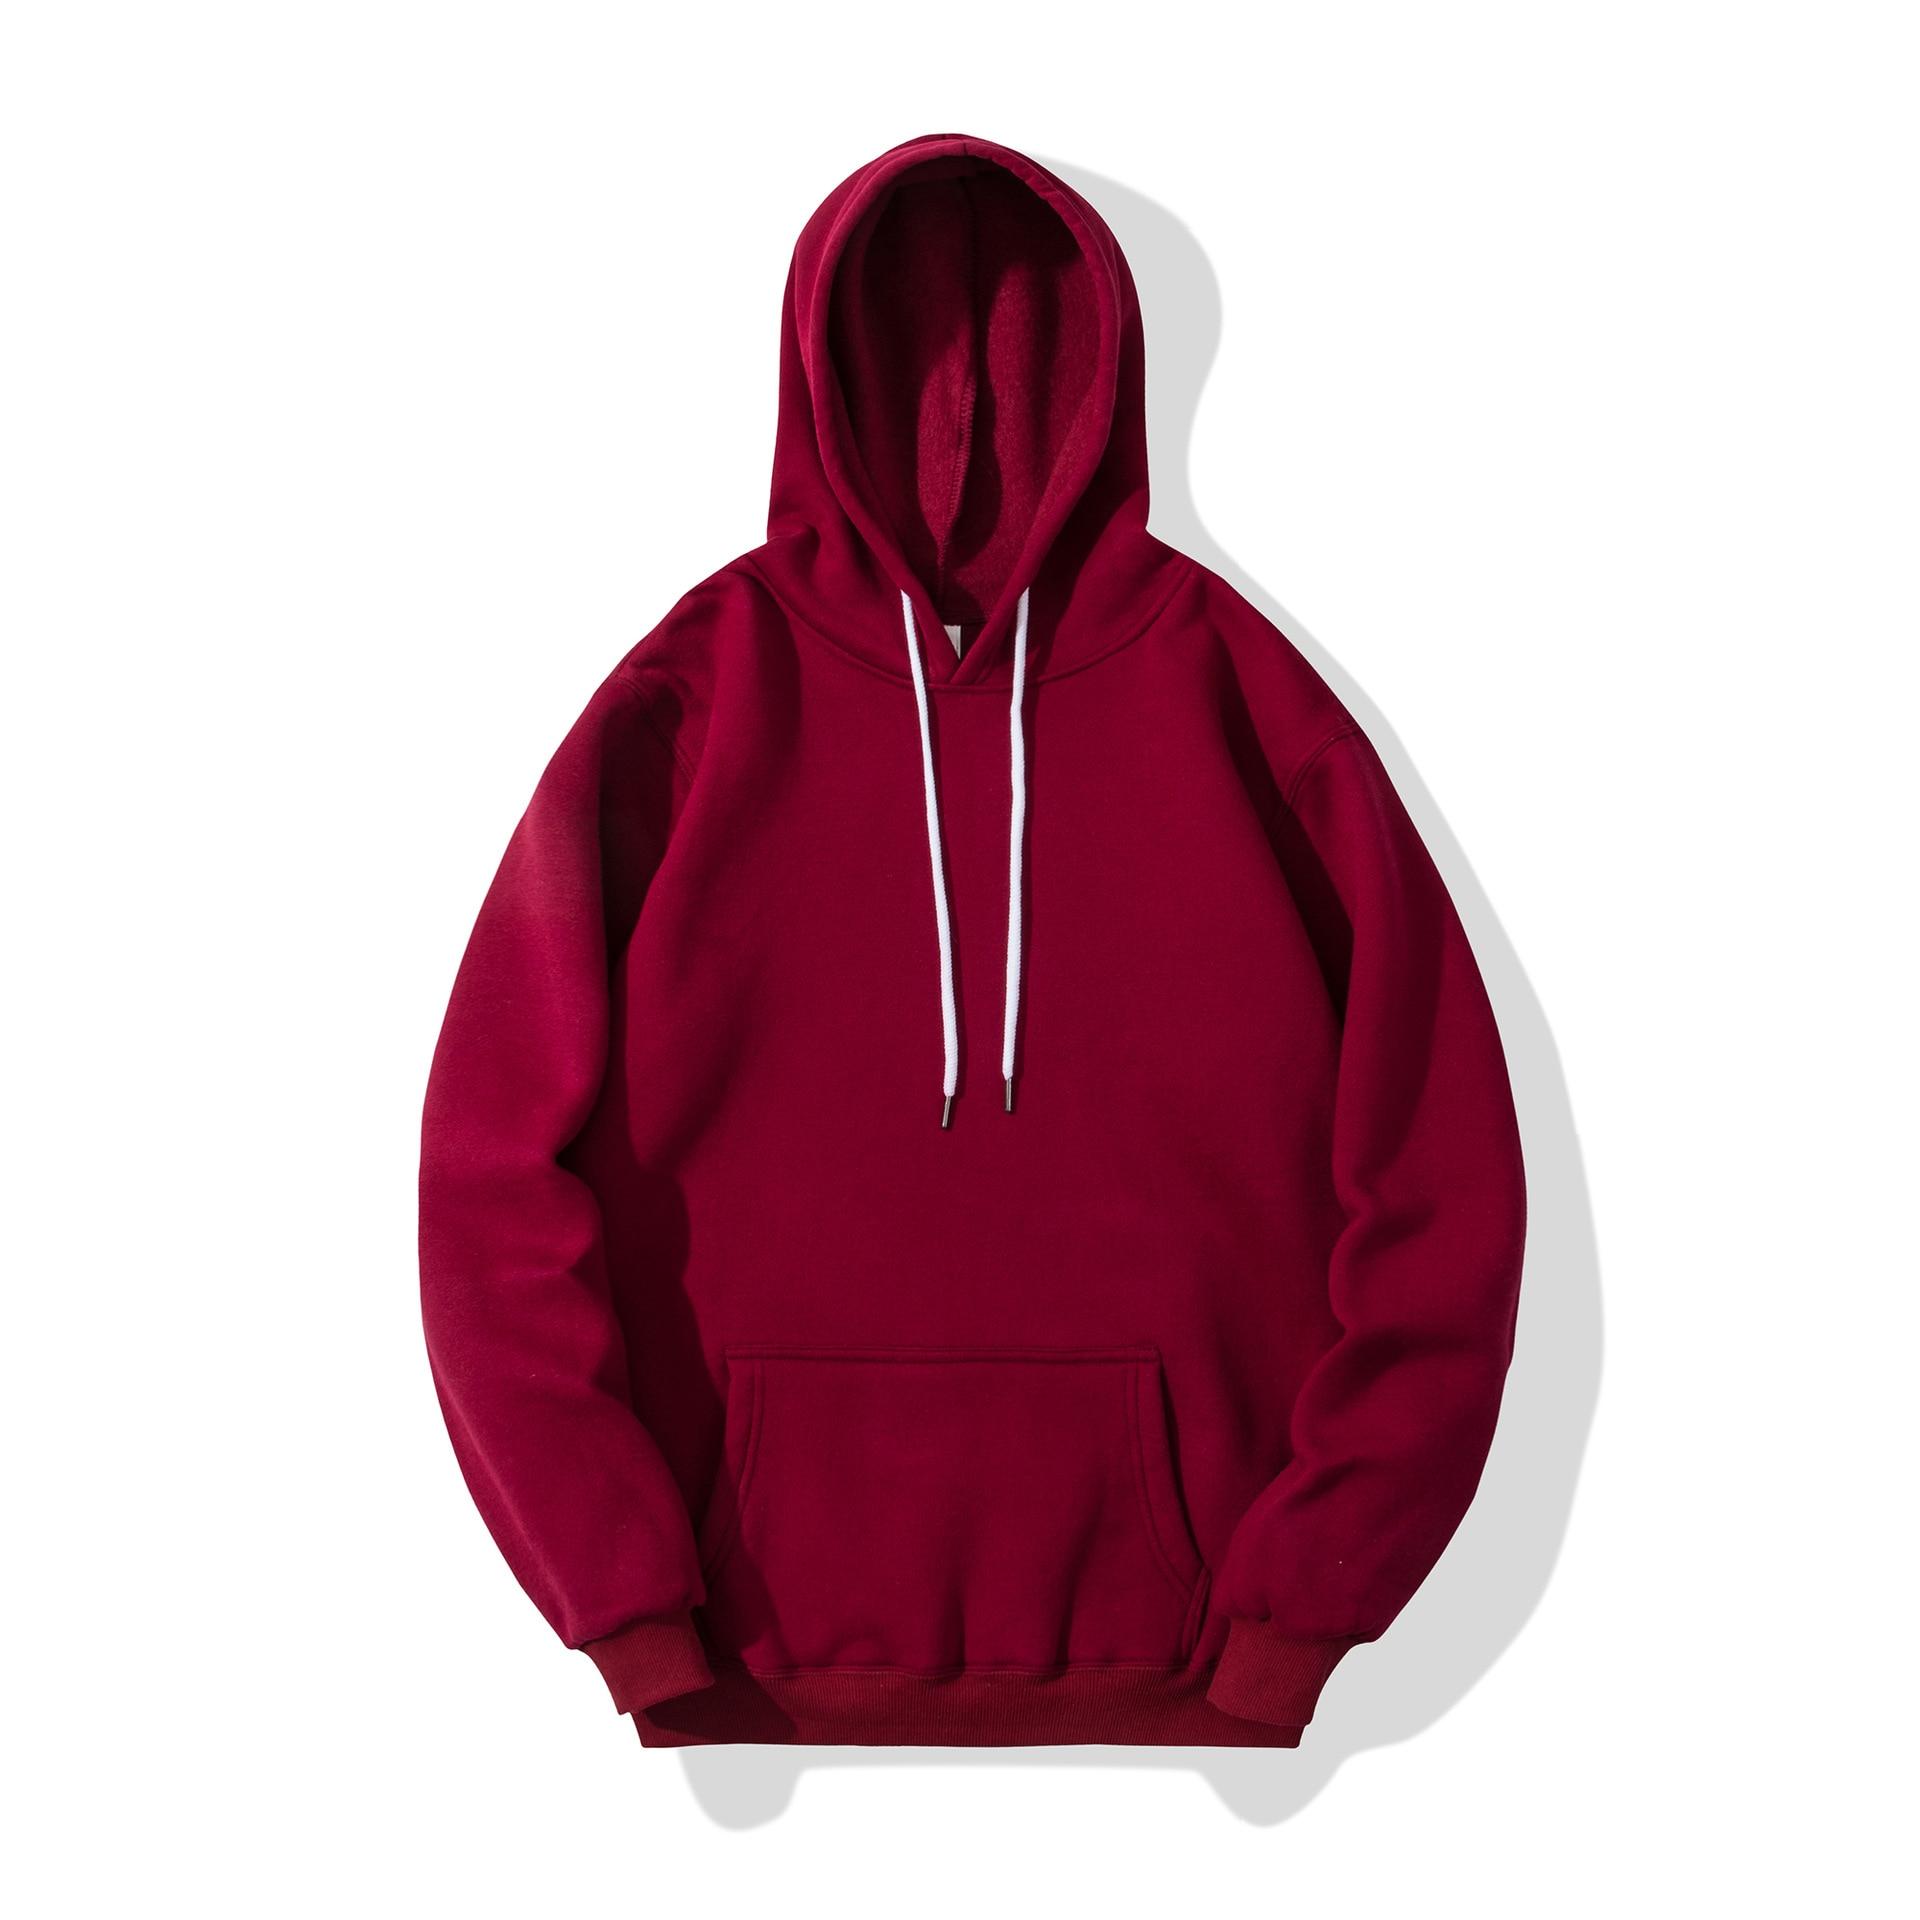 Hot 2019 Fashion Brand Men's Hoodies Casual Hoodies Sweatshirts Autumn Winter Solid Color Pullover Tops Men Women Sweatshirt